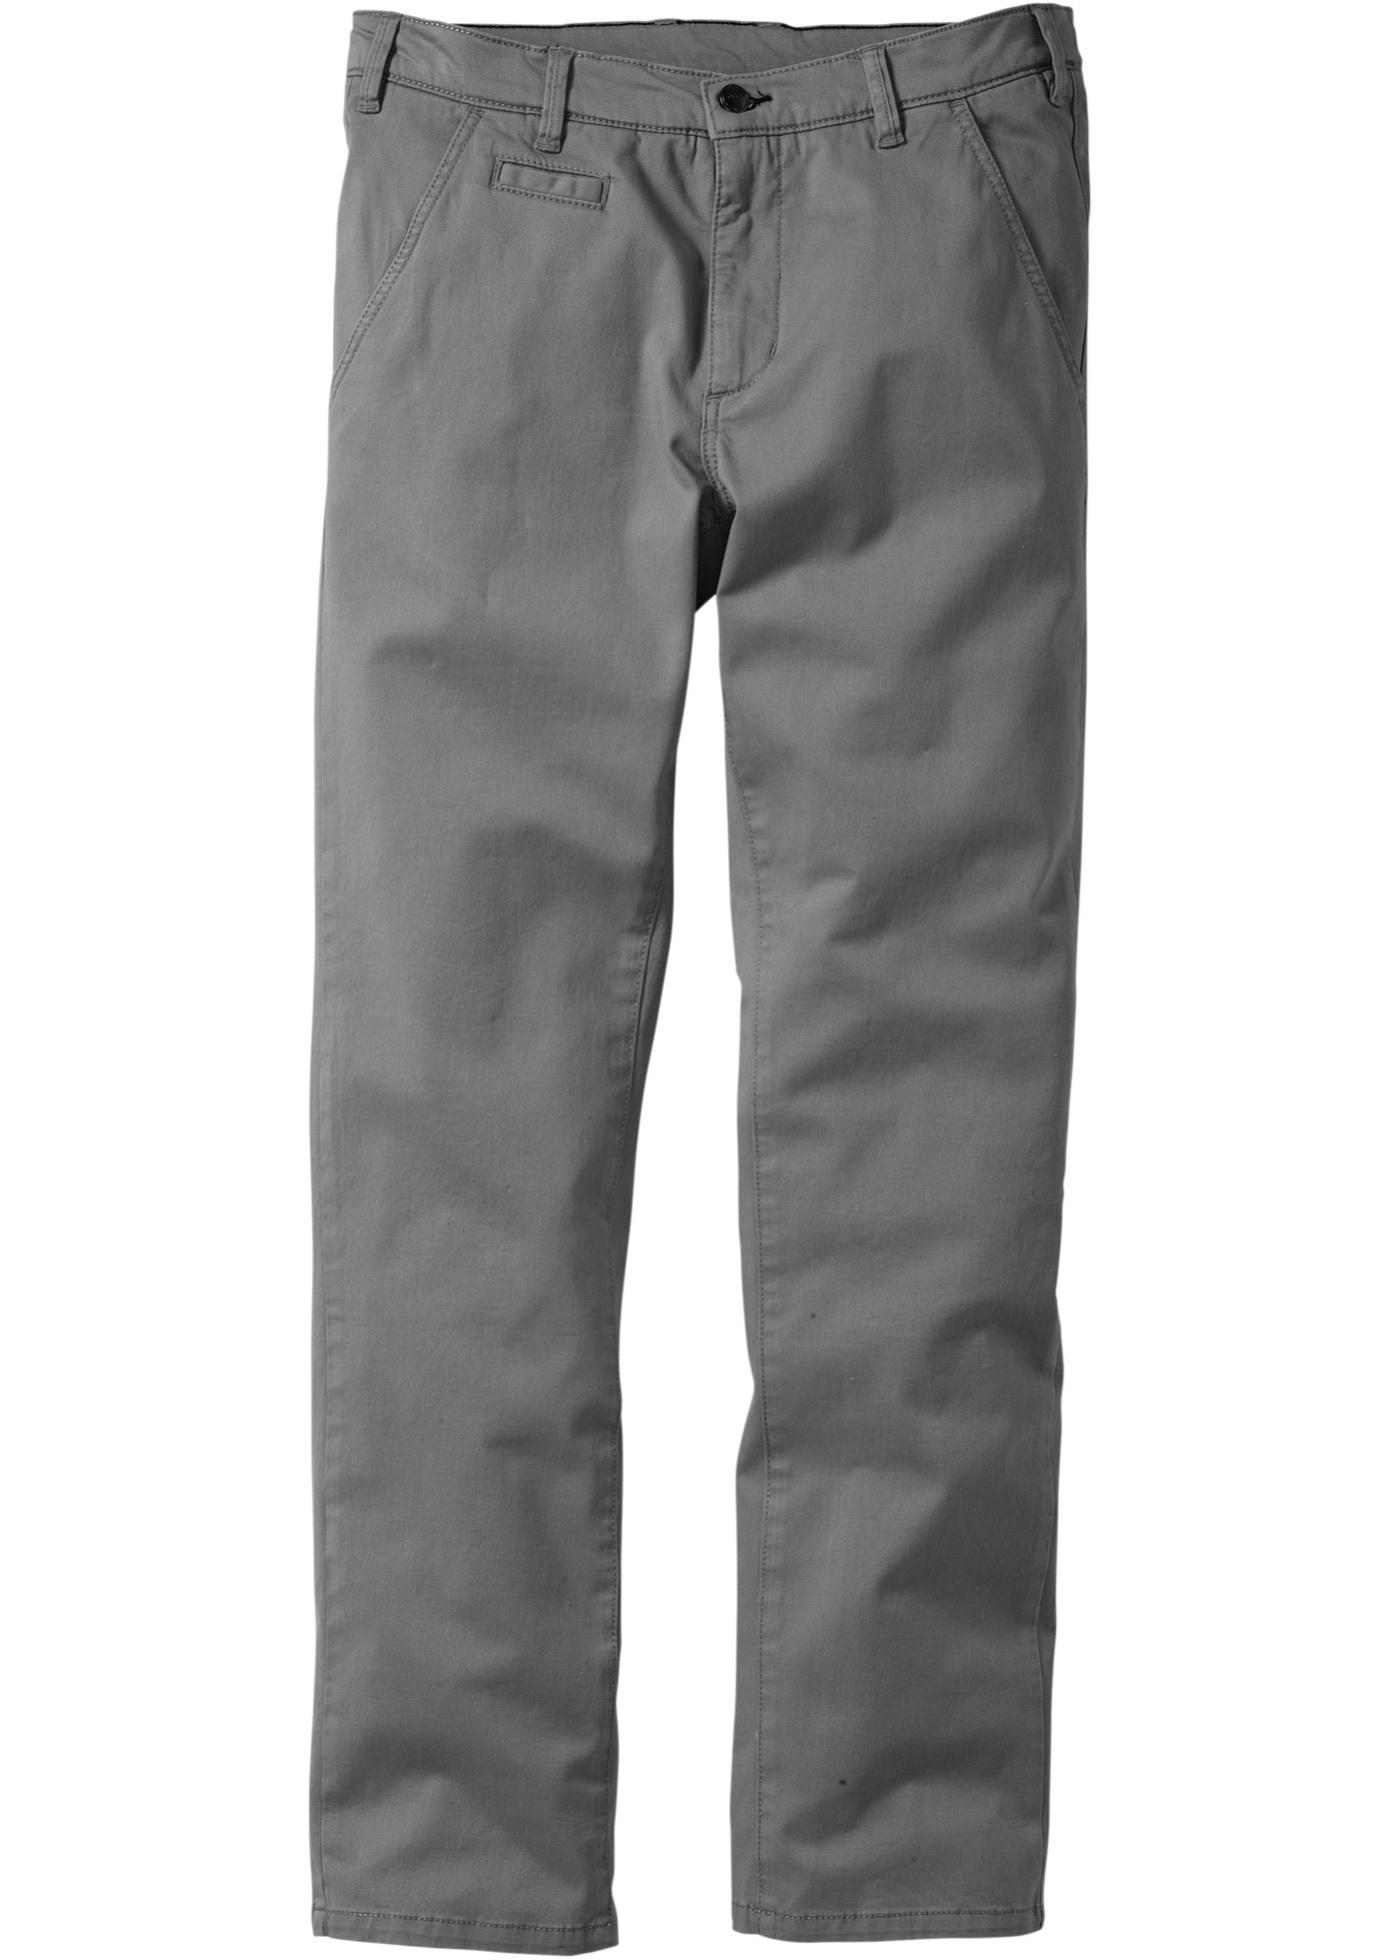 d470a6aee7c2 Pantalone chino elasticiz · Pantalone chino elasticizzato slim fit ...